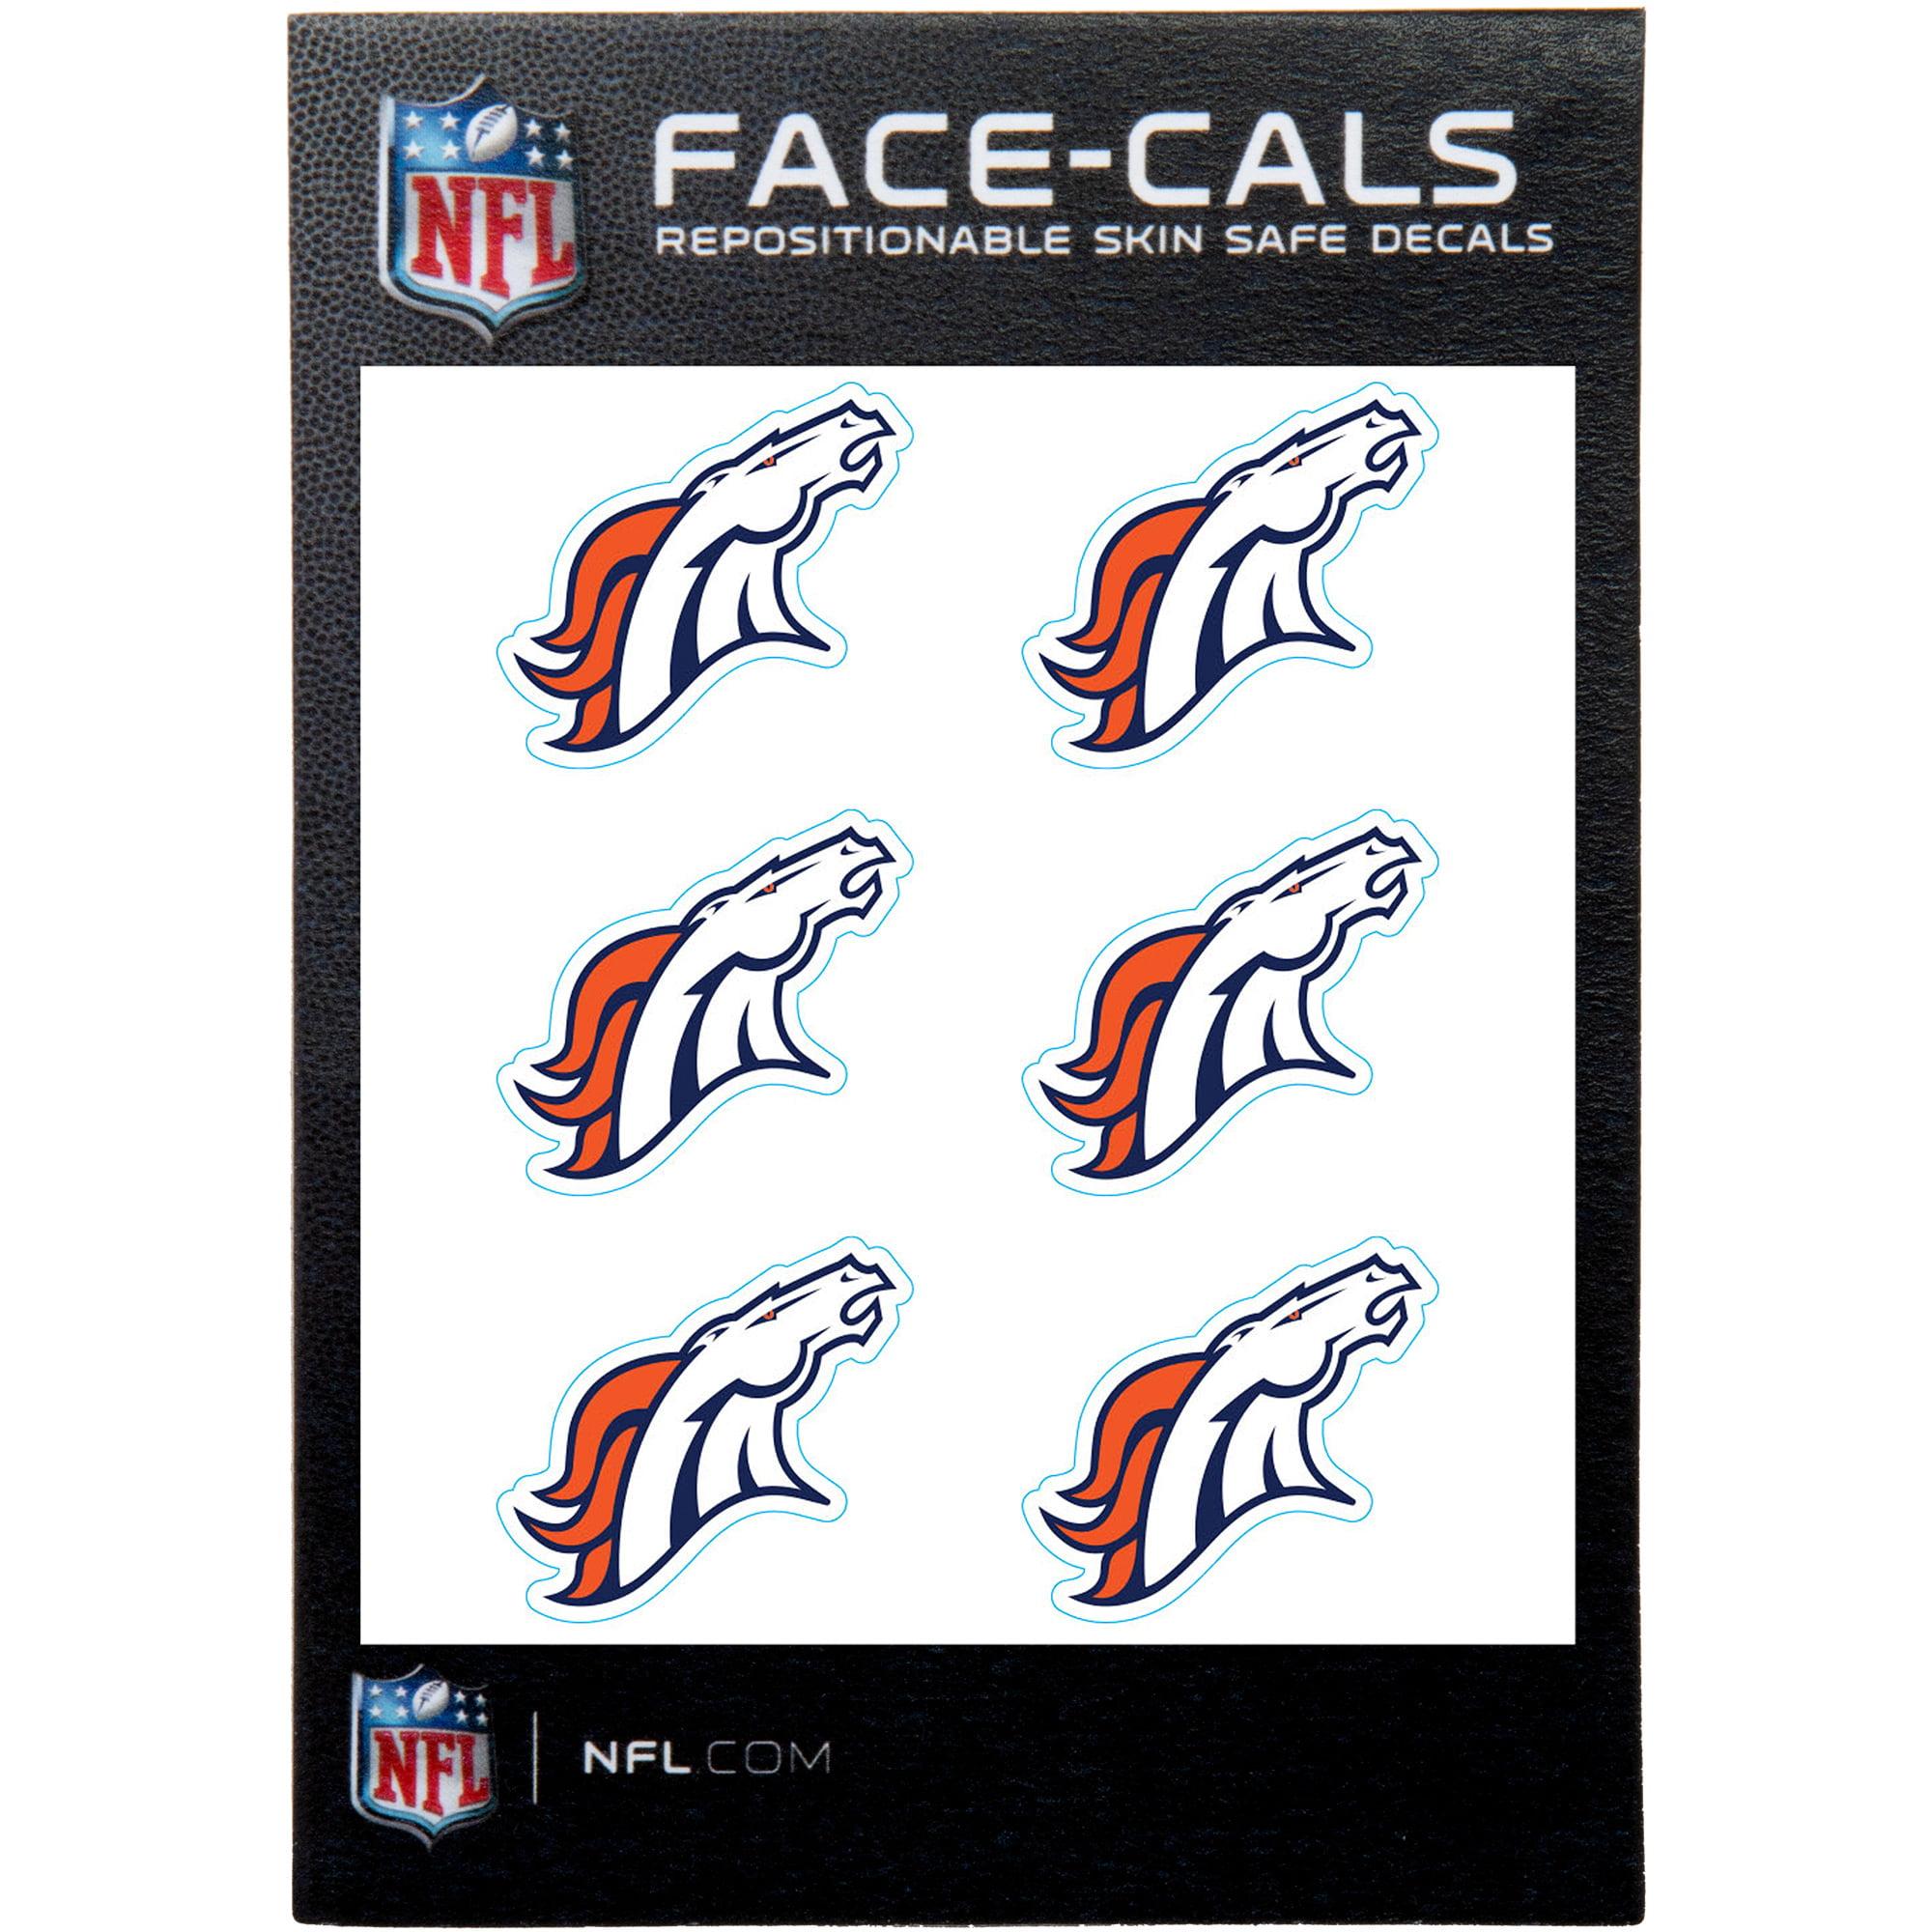 Denver Broncos 6-Pack Mini-Cals Face Decals - No Size